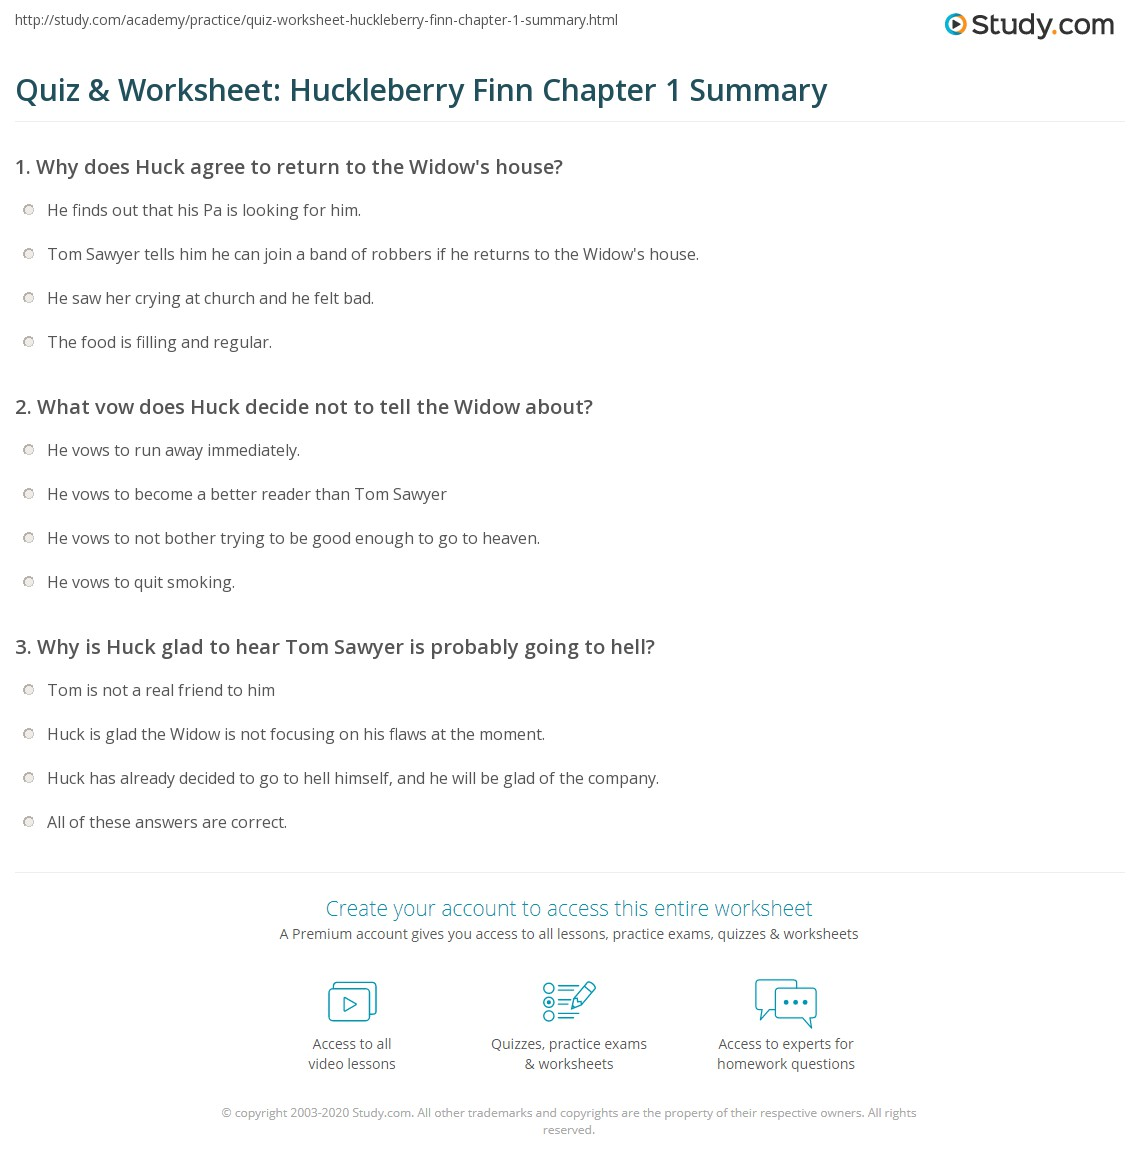 Quiz & Worksheet: Huckleberry Finn Chapter 1 Summary | Study.com